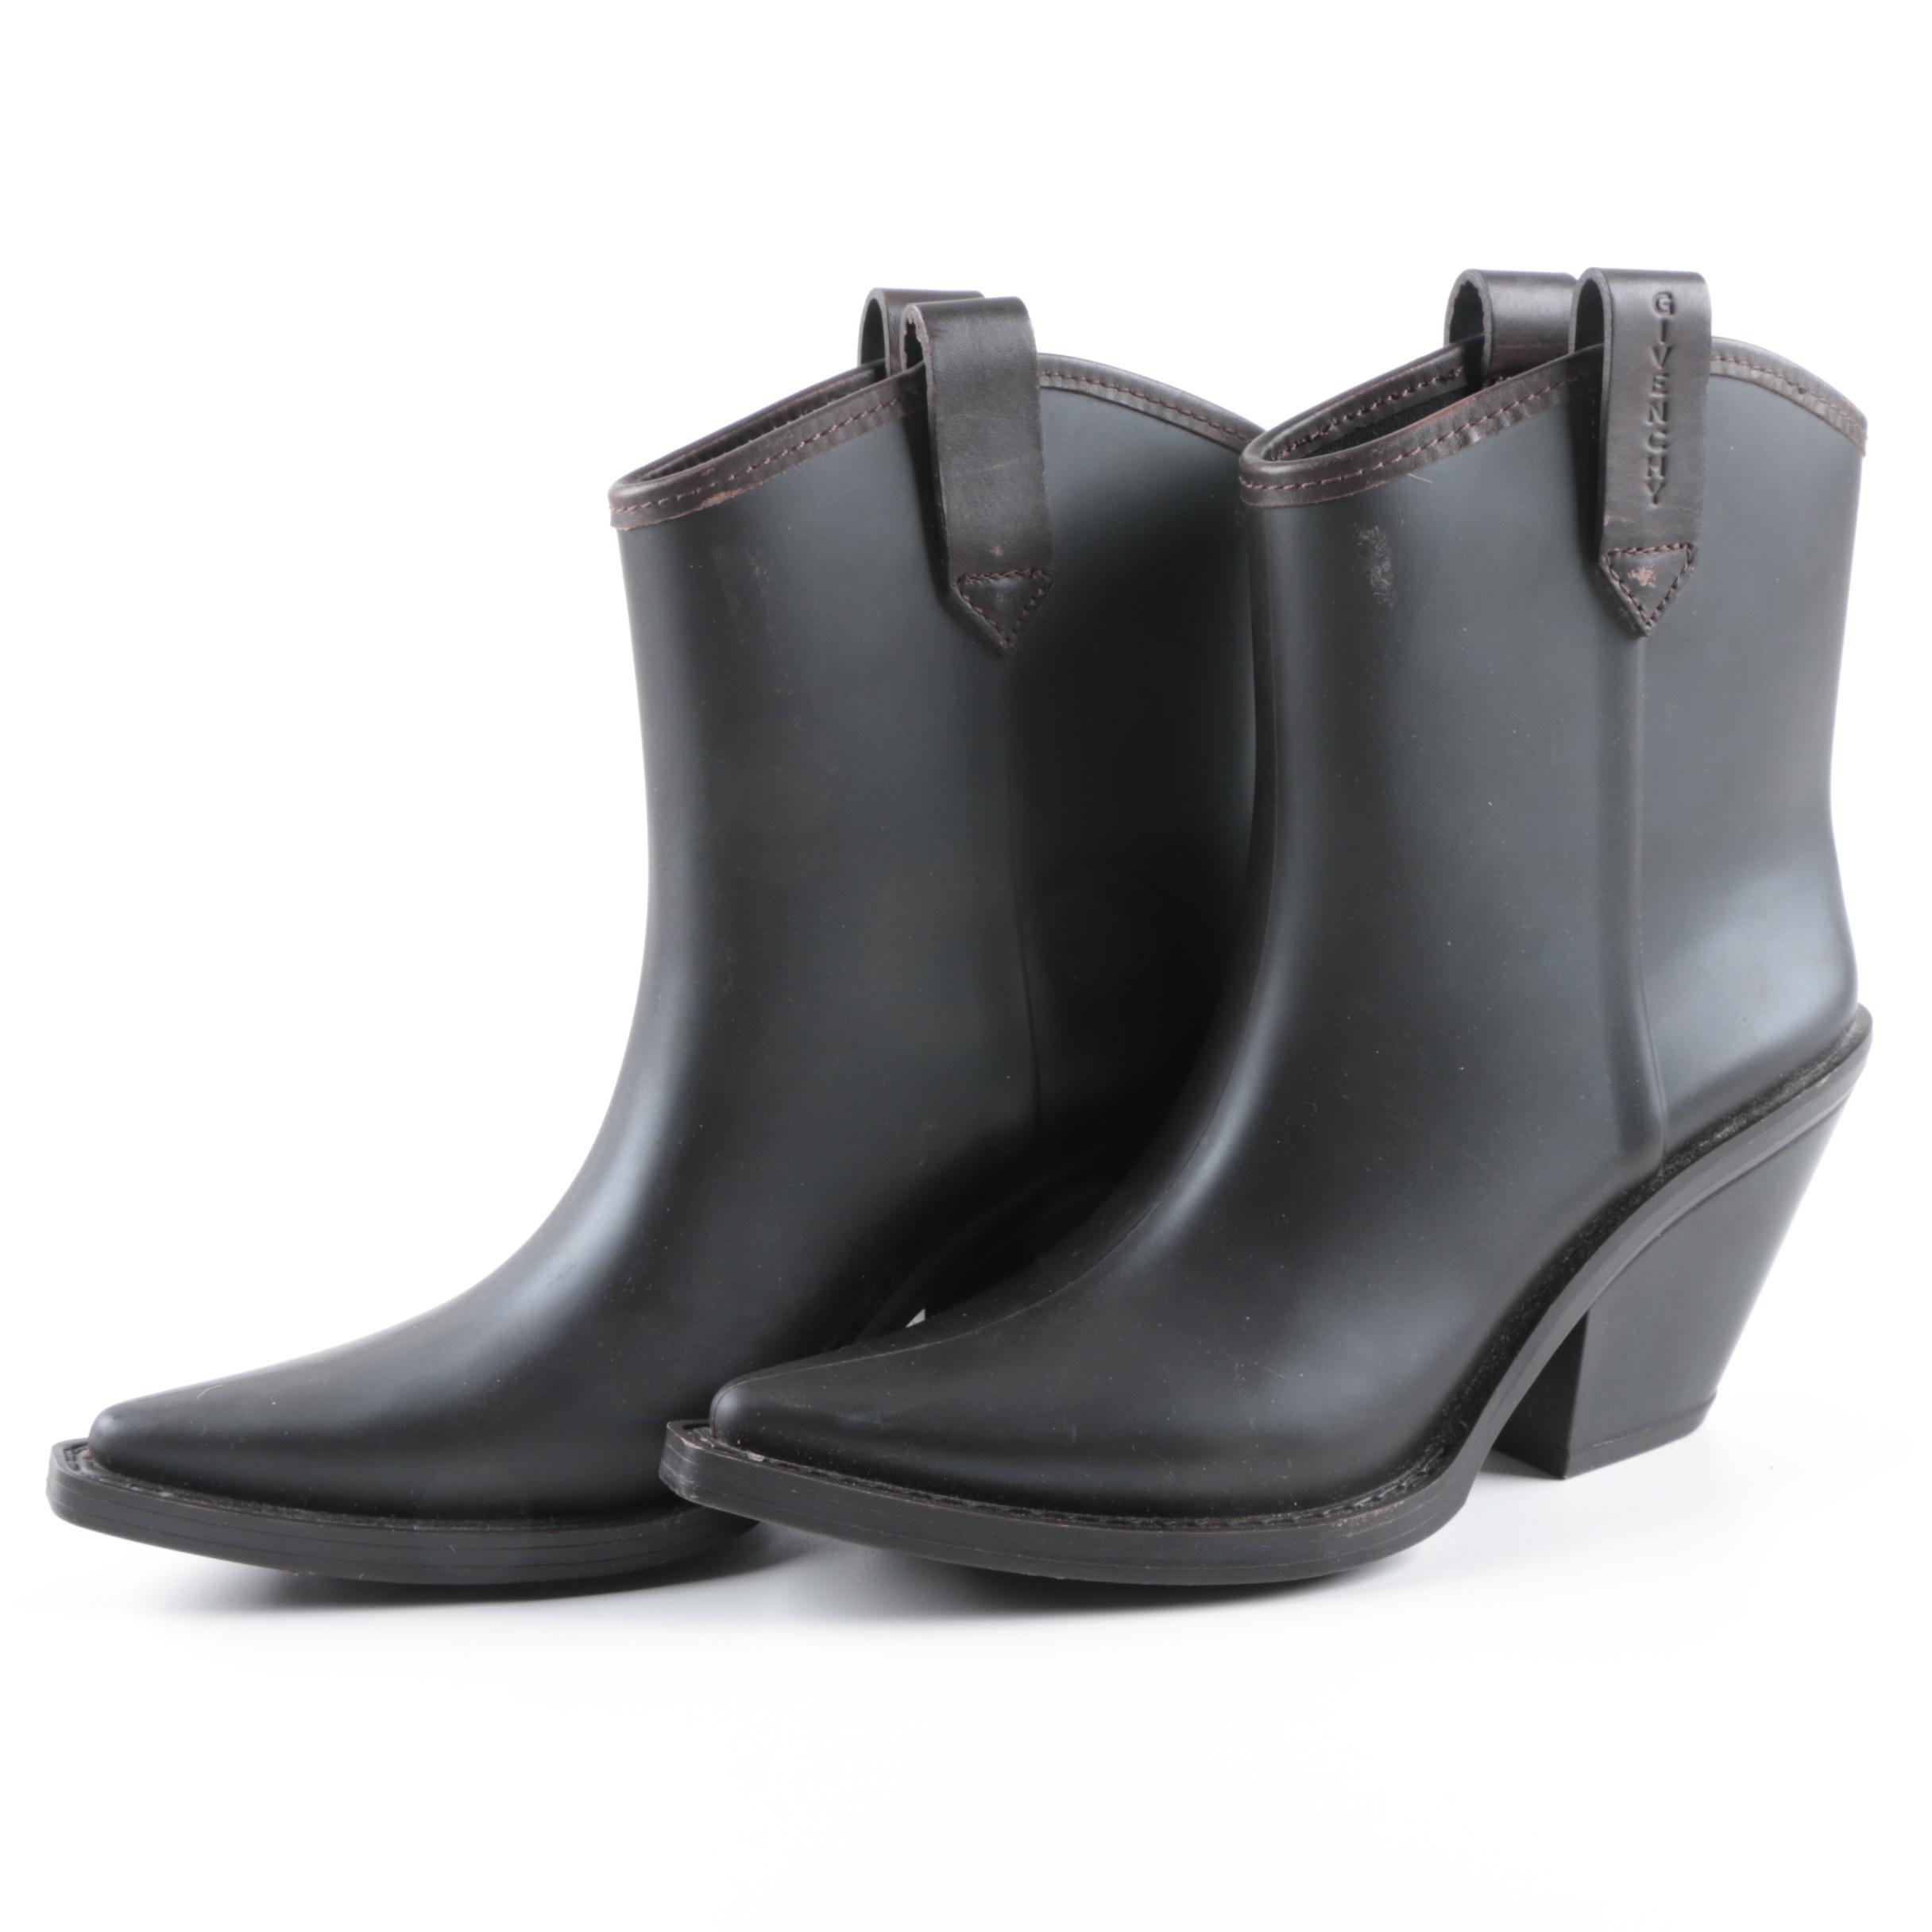 Givenchy Western Rain Boots